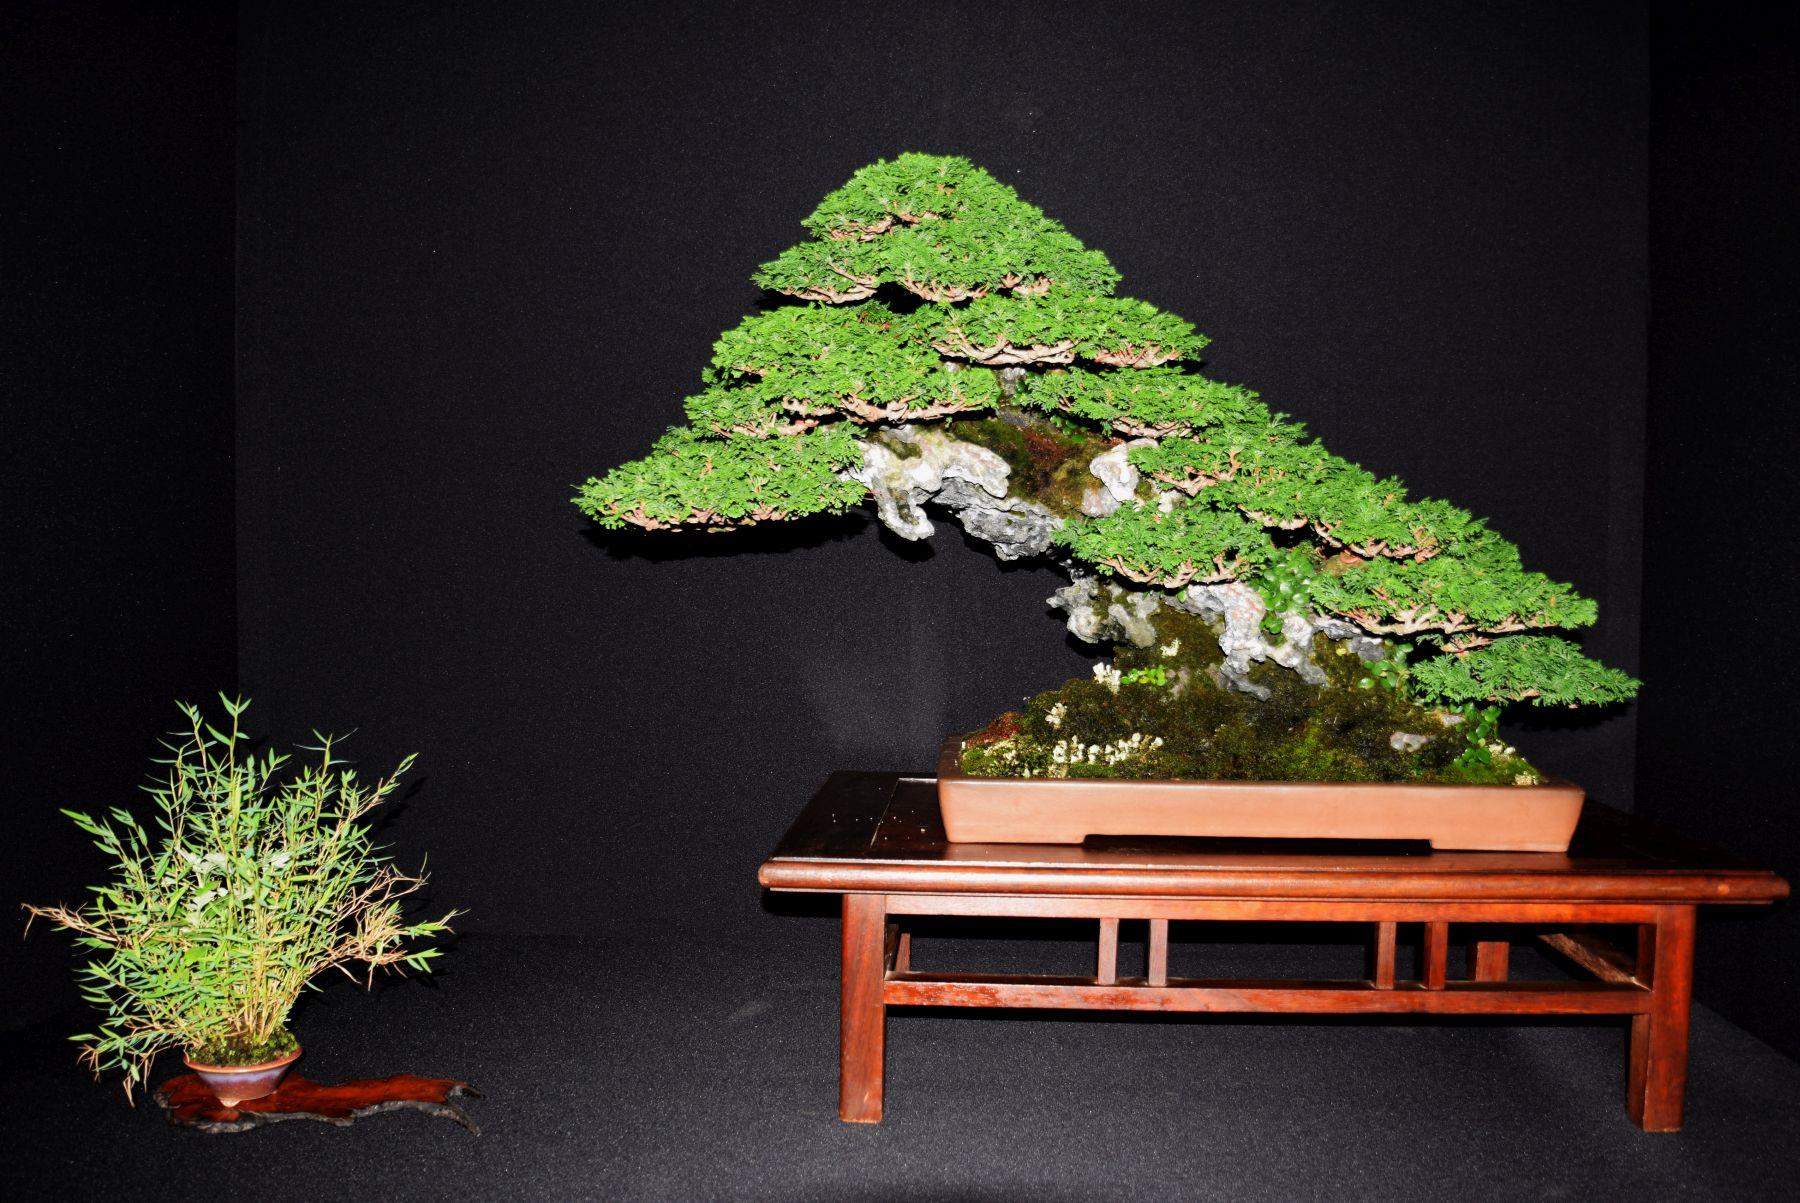 bonsai-museum-luis-vallejo-019